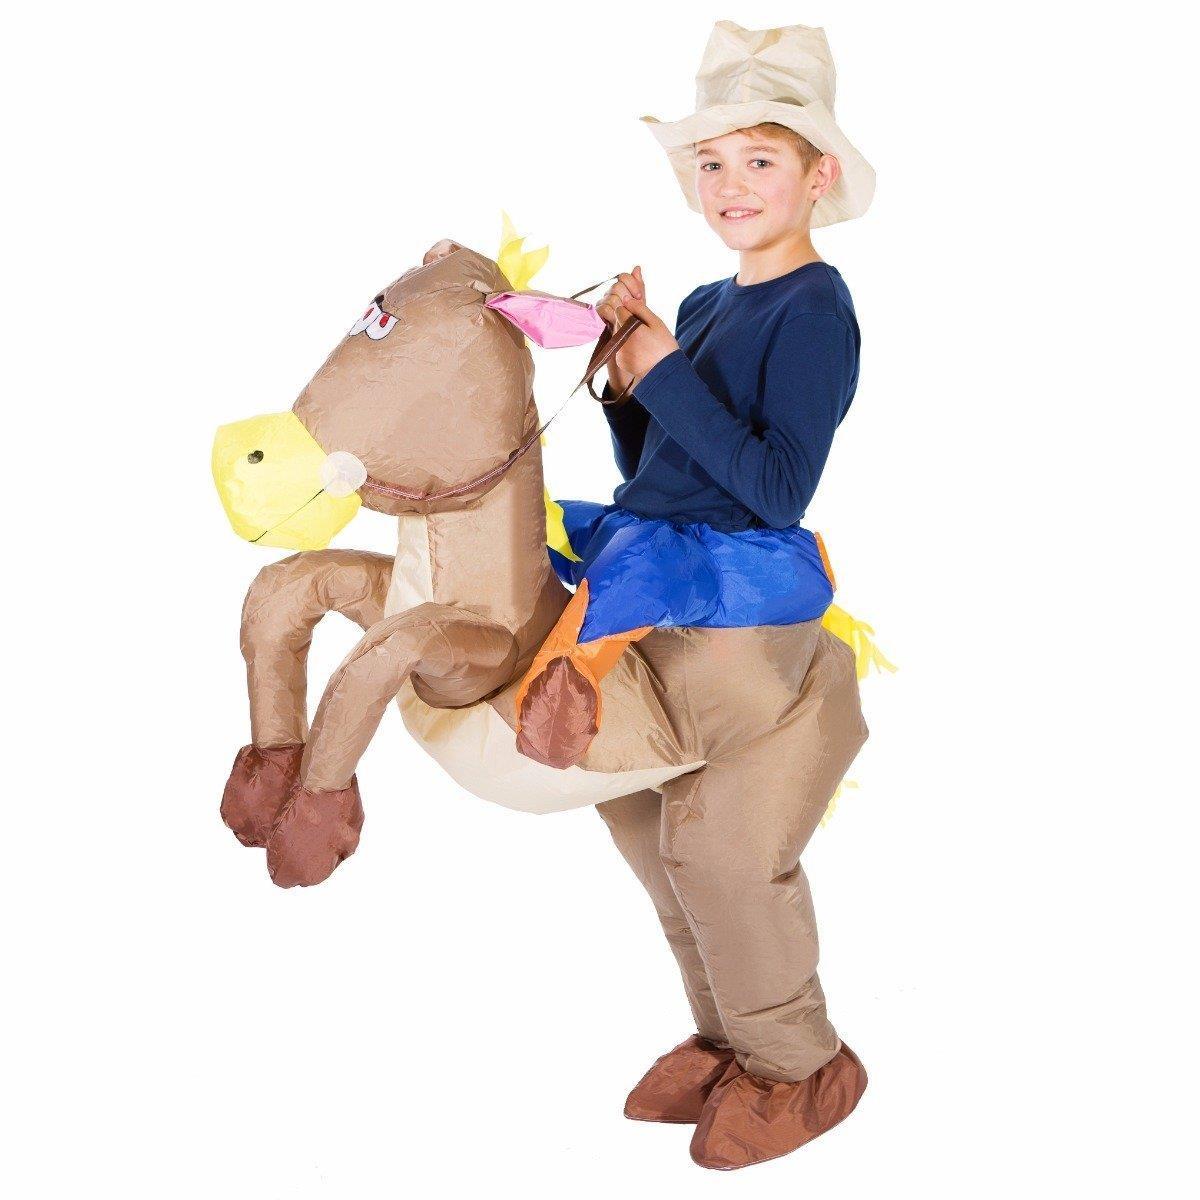 Cowboy Horse Inflatable Size O S Kids Animal Costume Bodysocks Walmart Com Walmart Com